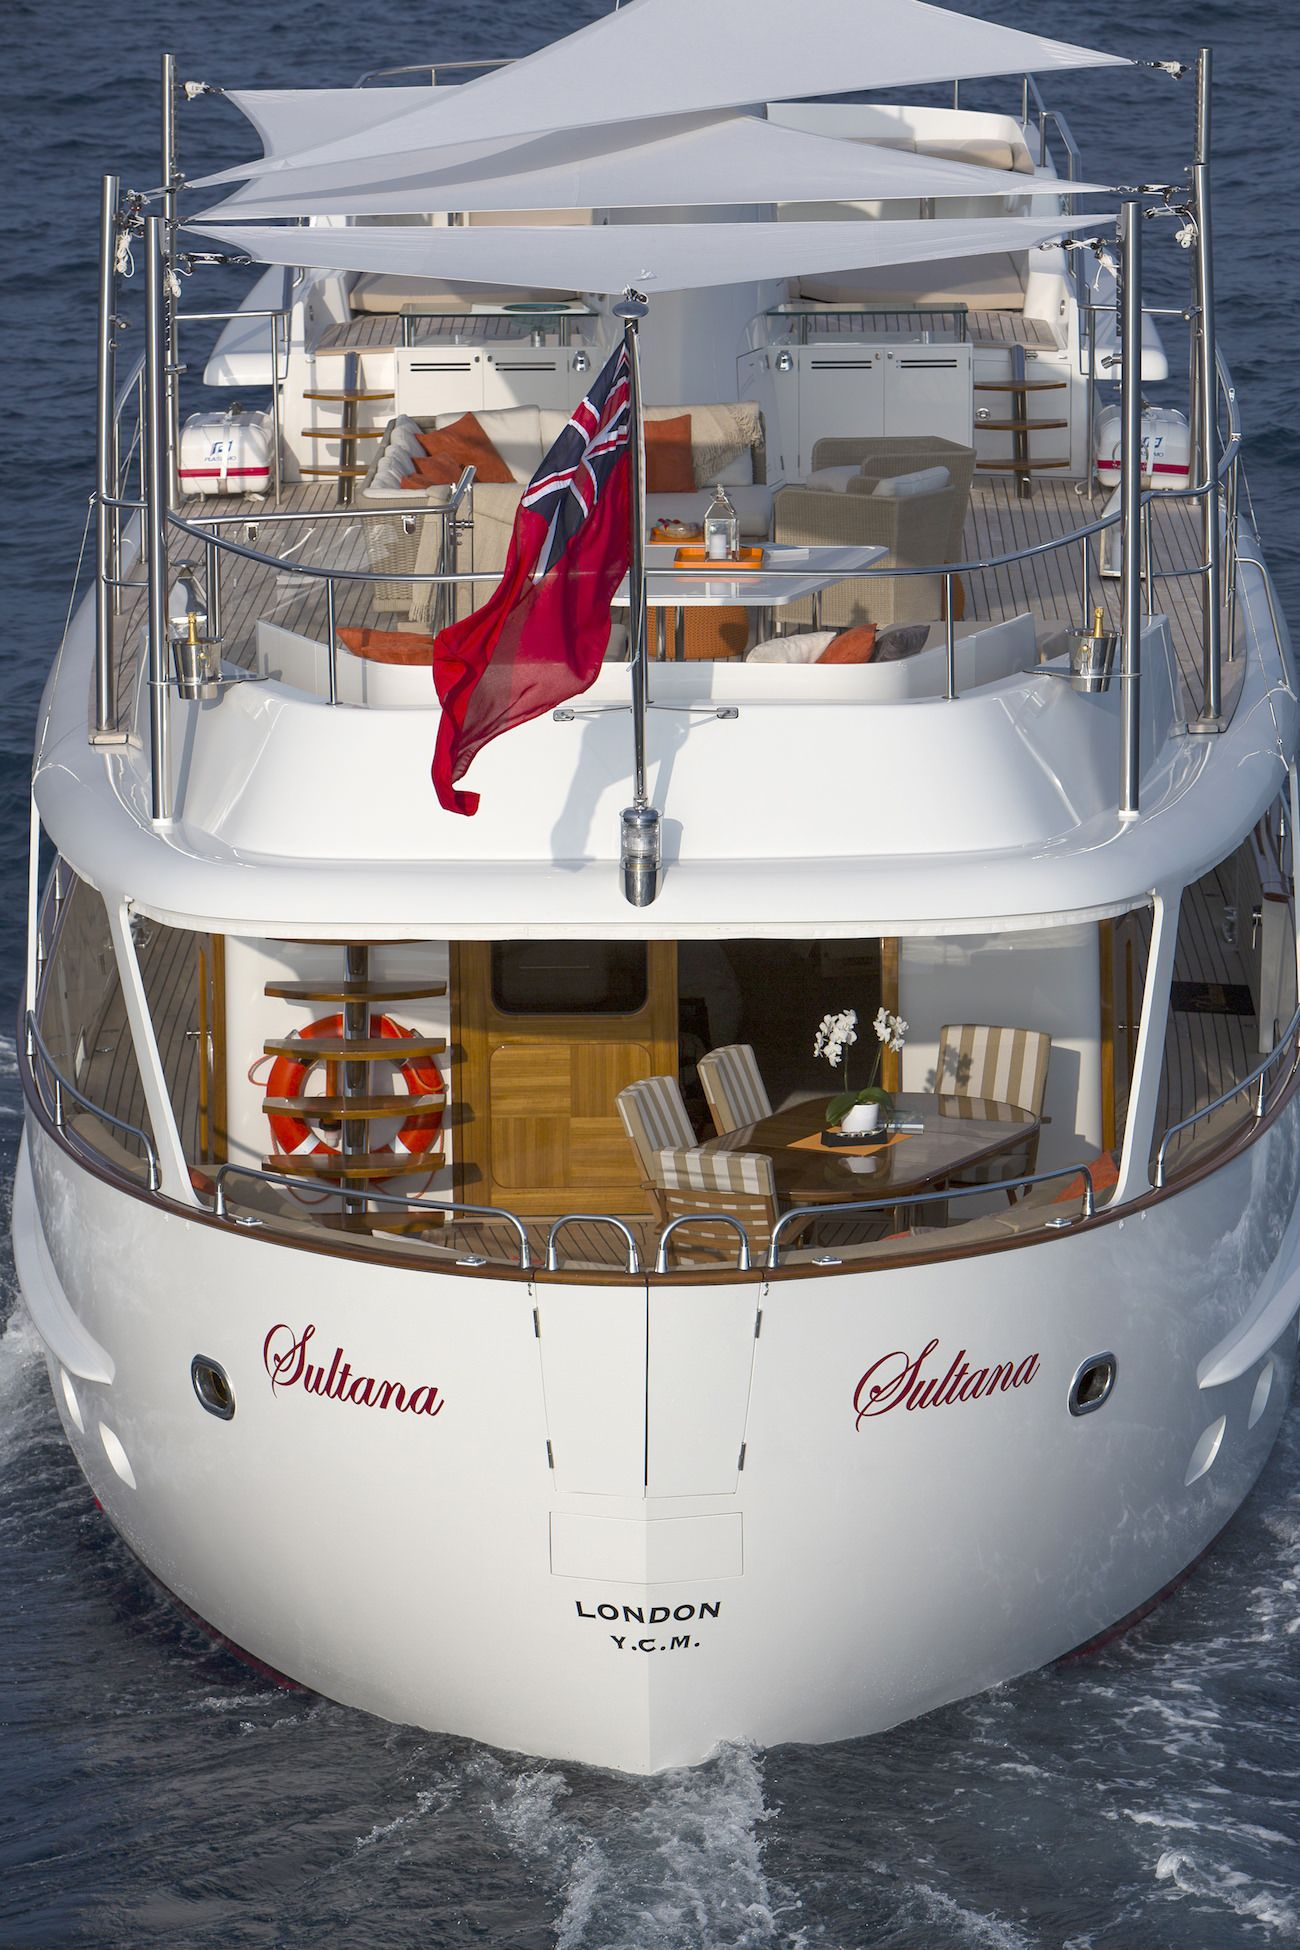 sultana 26m yacht pinterest. Black Bedroom Furniture Sets. Home Design Ideas